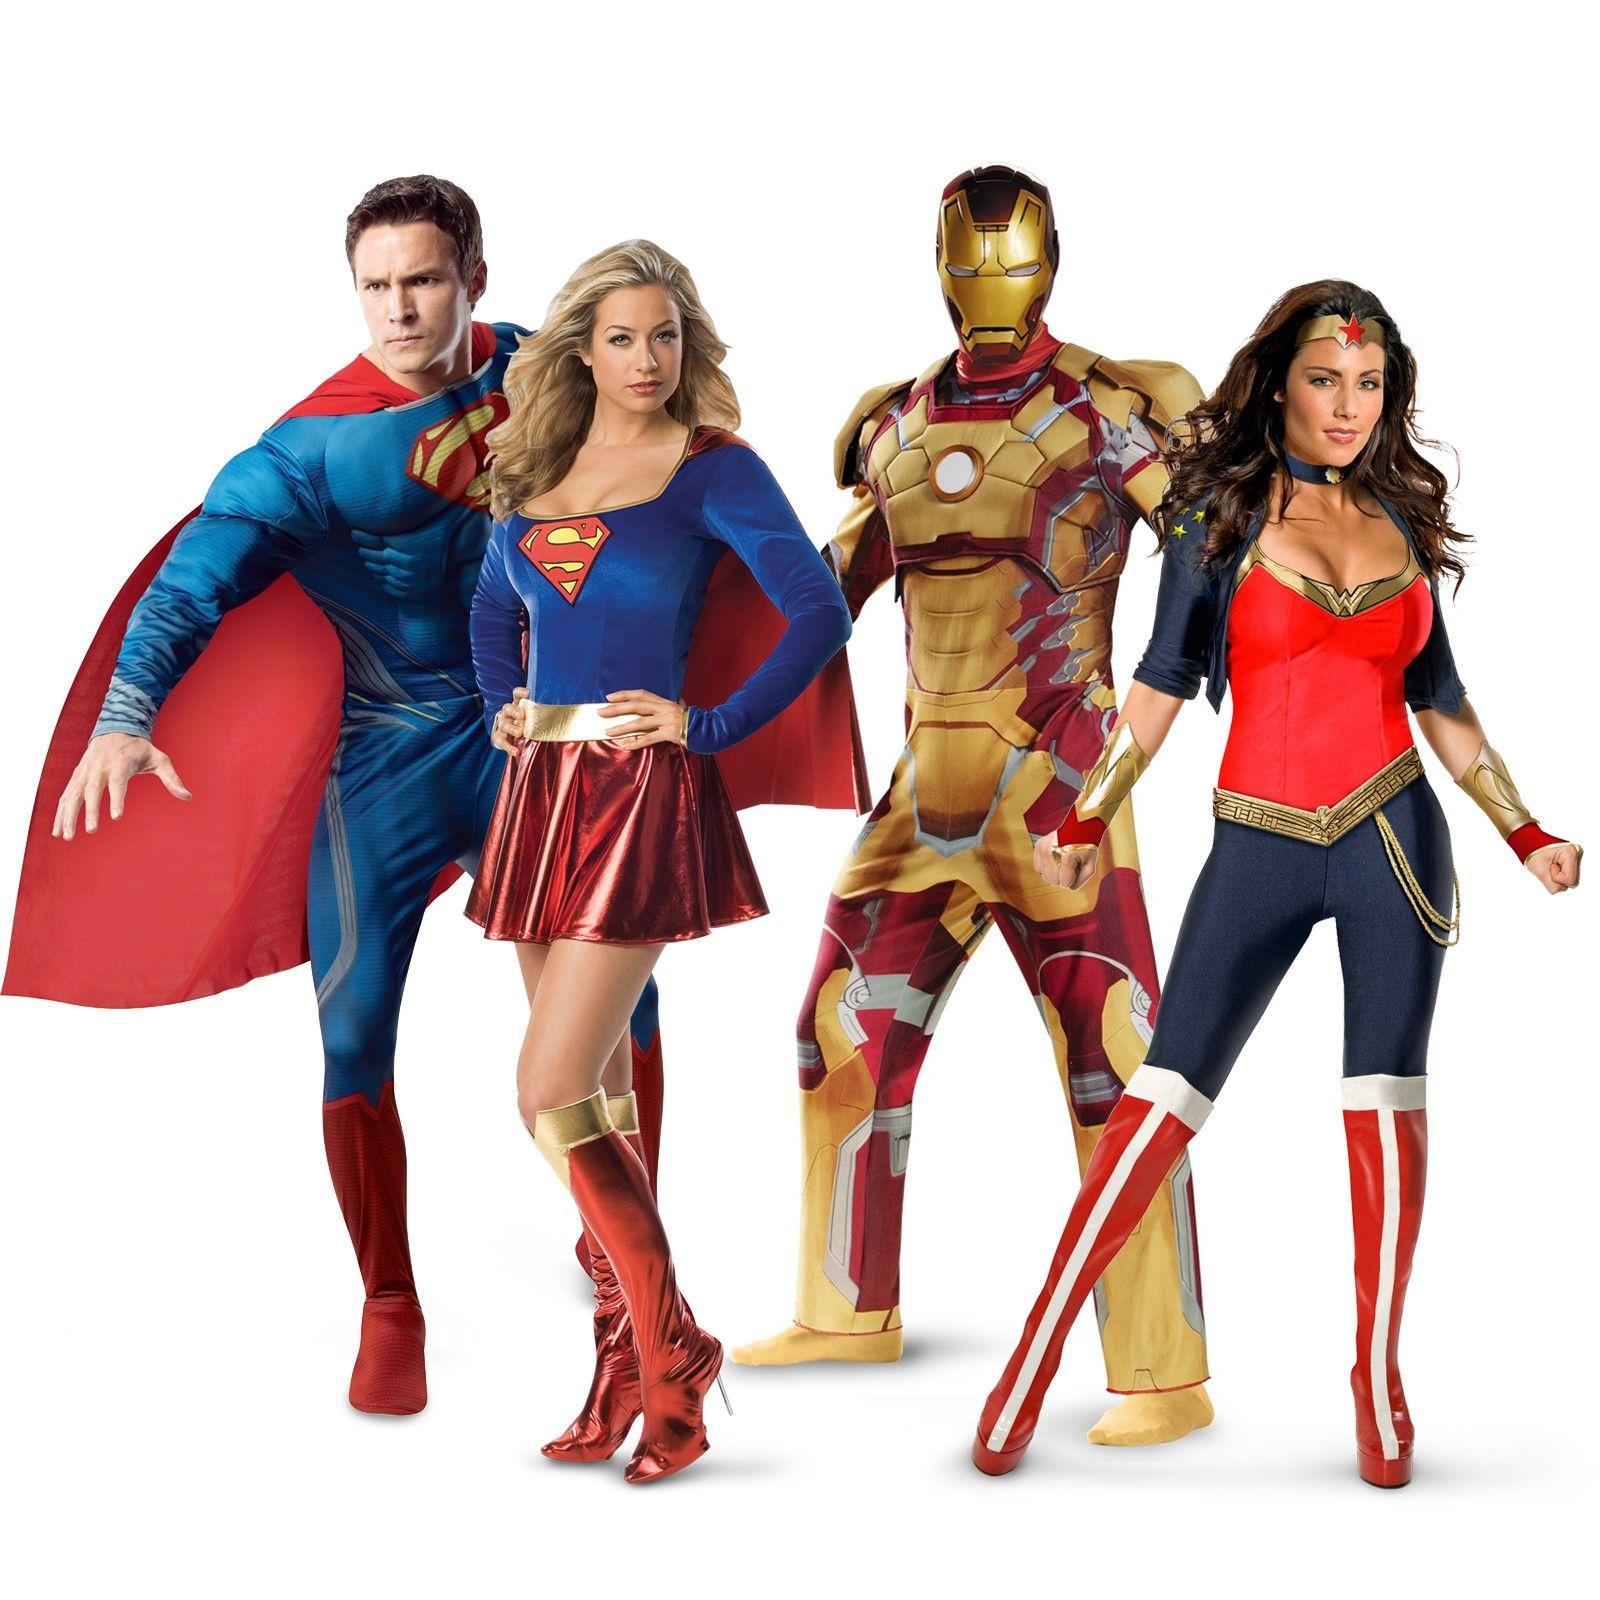 Superheroes Heroinas Disfraces Superman Supergirl Ironman Wonder Woman Jpg 1600 1600 Ideas De Disfraces De Parejas Trajes De Super Heroes Disfraz De Superman